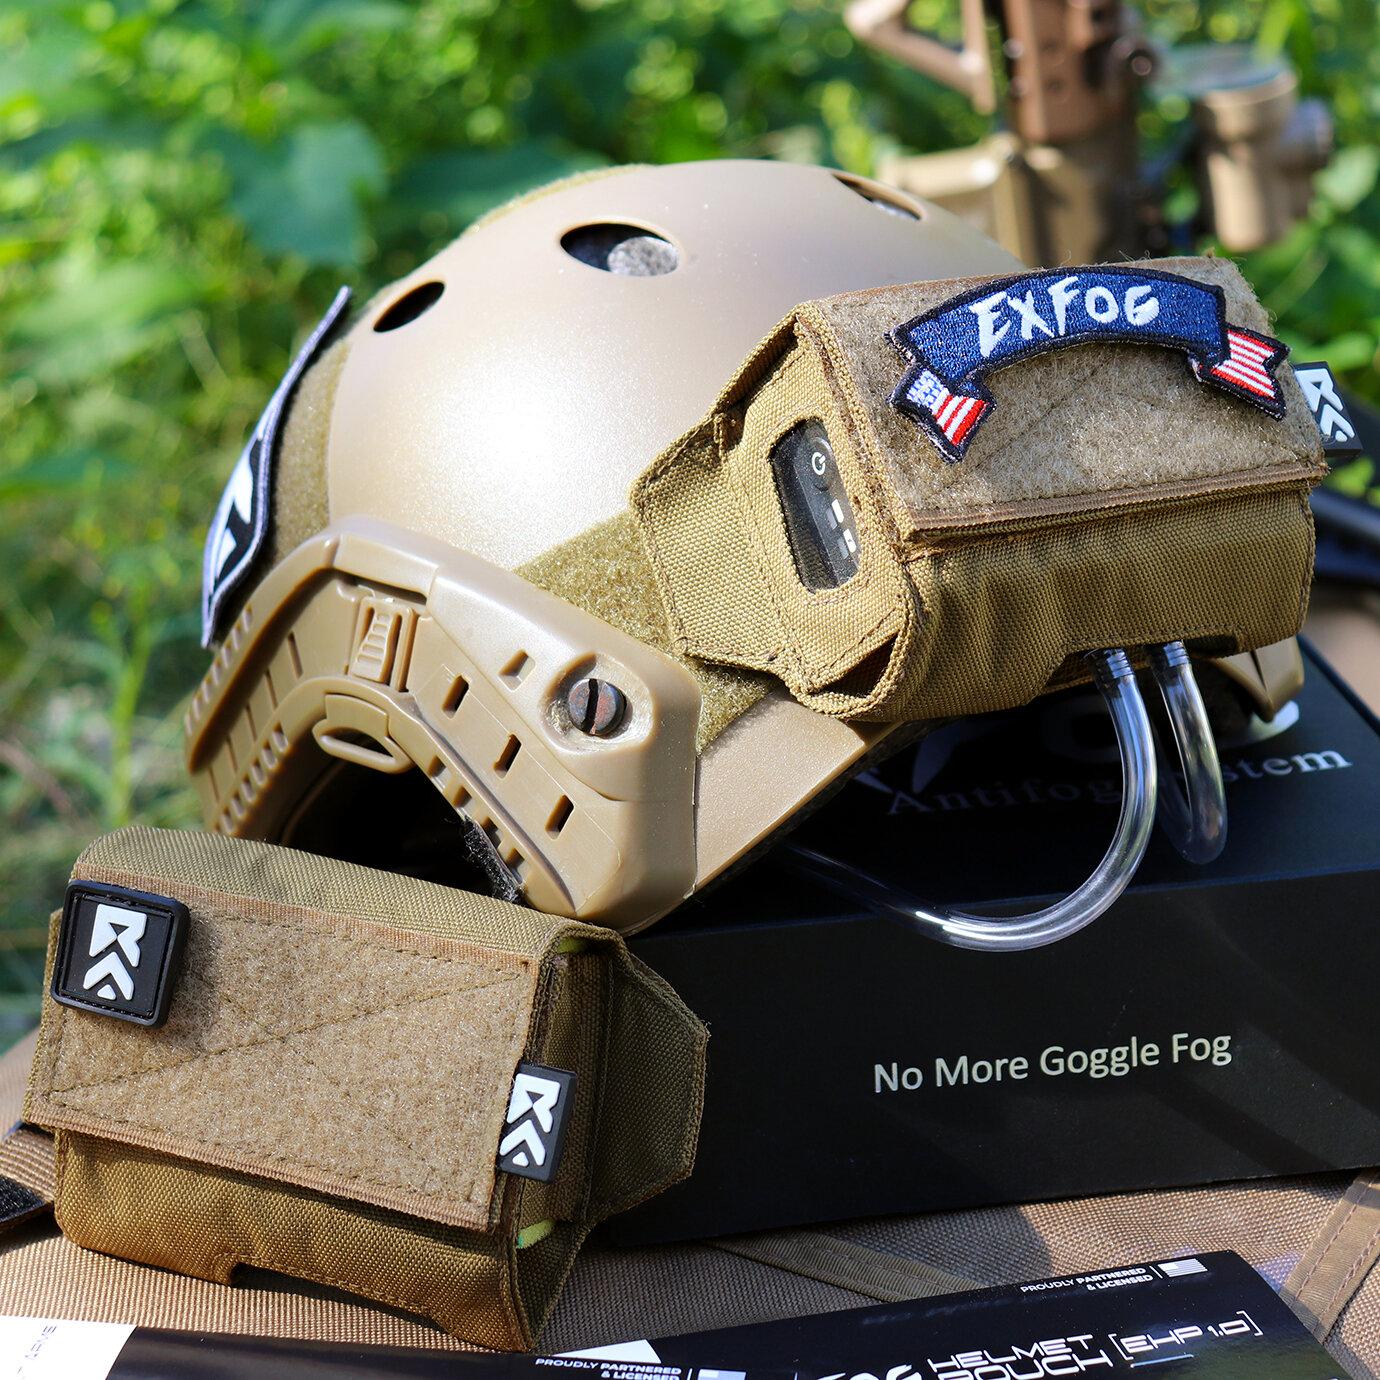 XHP EX-FOG Airsoft Paintball Helmet Pouch 1.0 Anti-Fog EXFOG NEW OD Green